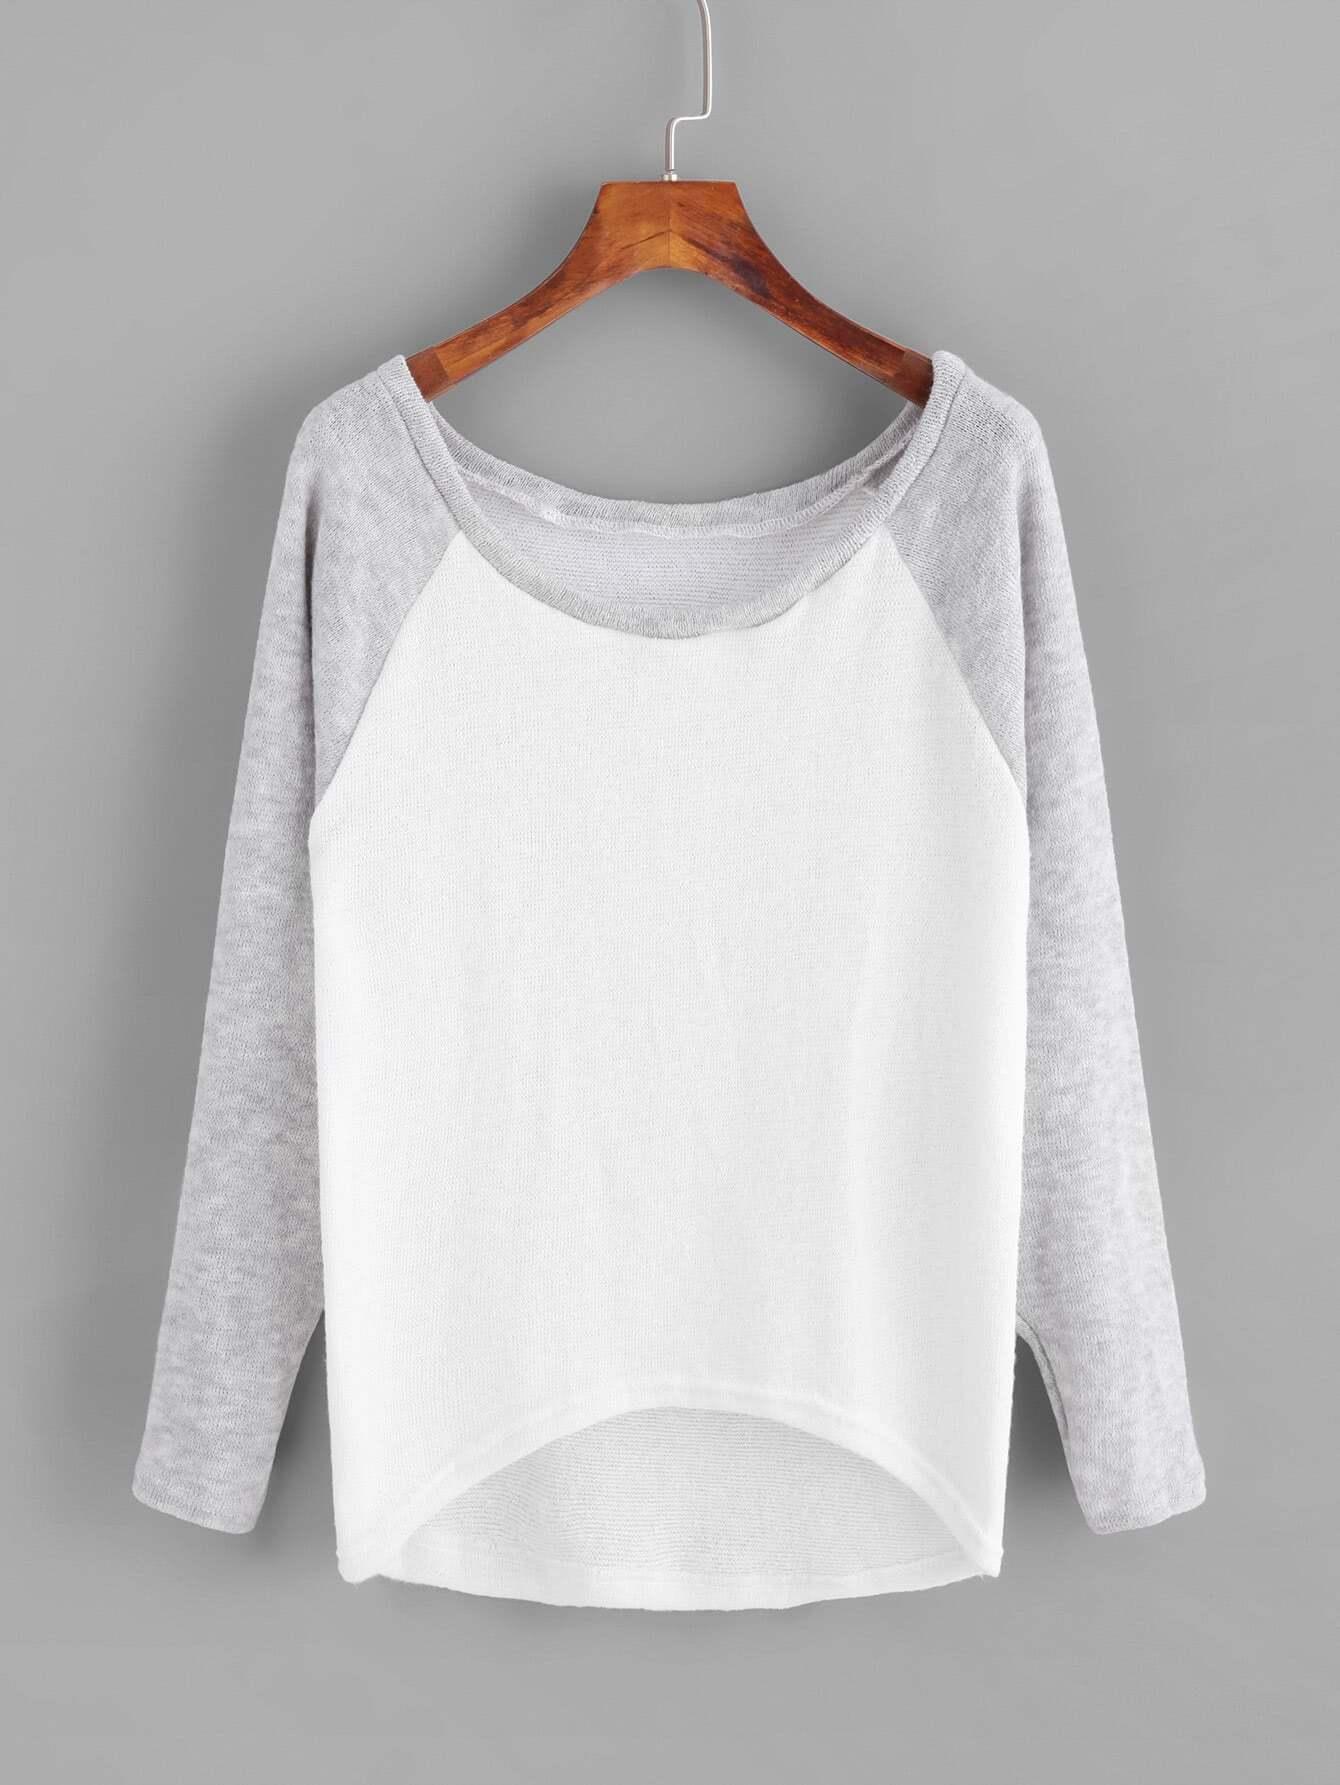 Contrast Raglan Sleeve Dip Hem Knit Sweater sweater170914111